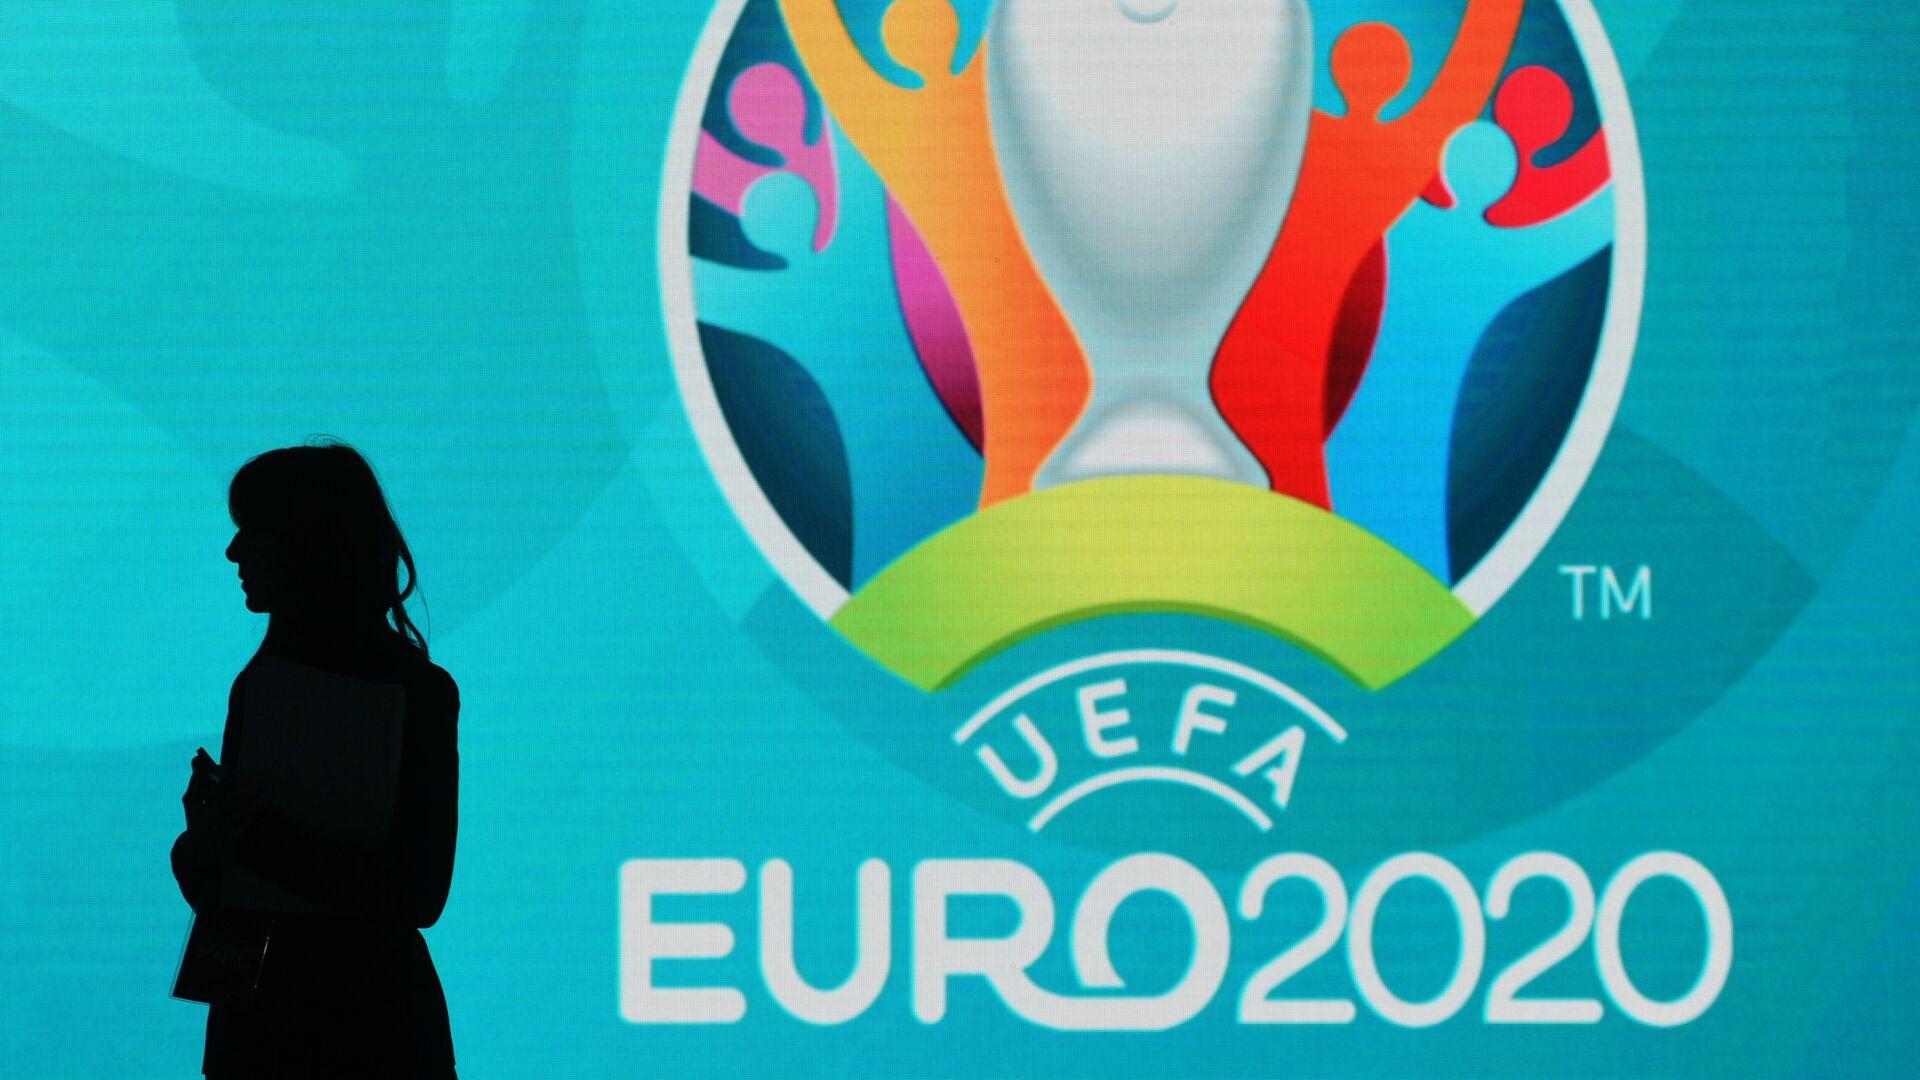 UEFA EURO 2020 - Sputnik Italia, 1920, 22.04.2021